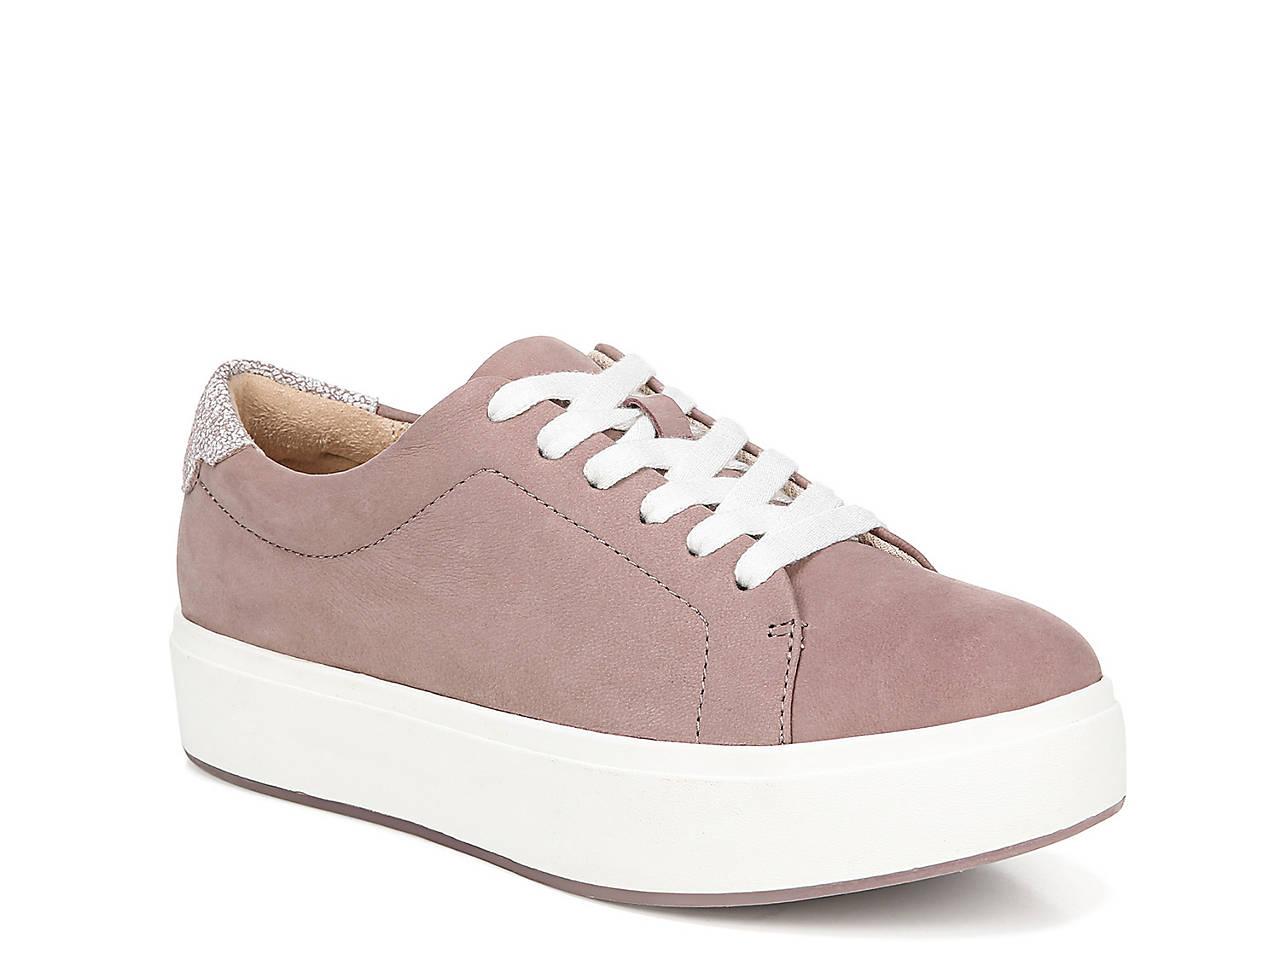 e69d04346f3 Dr. Scholl s Abbot Laced Platform Sneaker Women s Shoes